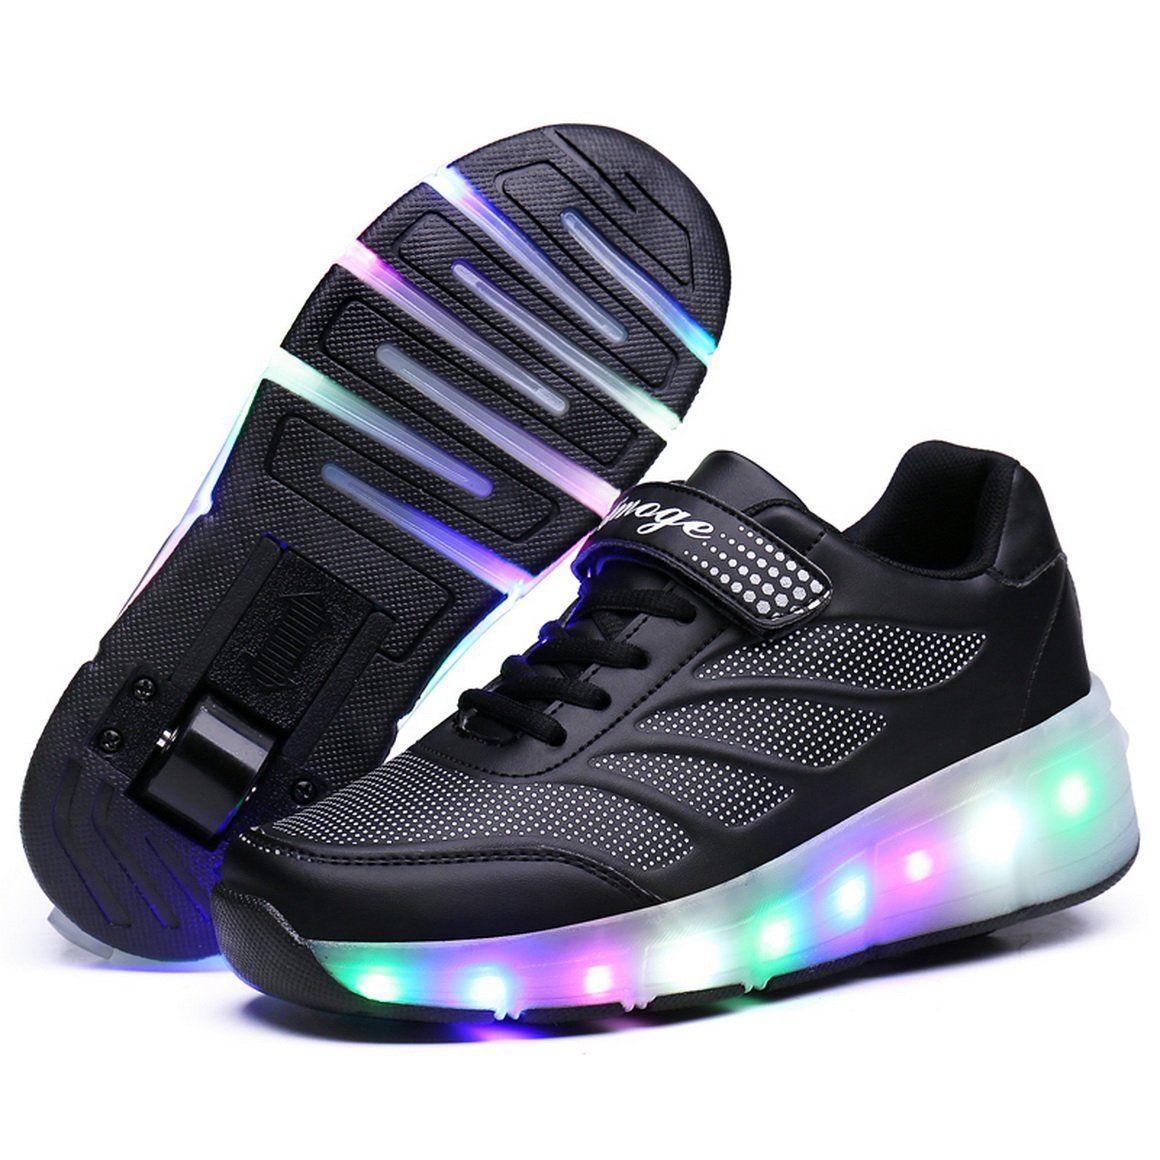 quality design 603d8 ddbc0 FOUPLER Girls Boys LED Light Single Wheel Roller Shoes Kids ...